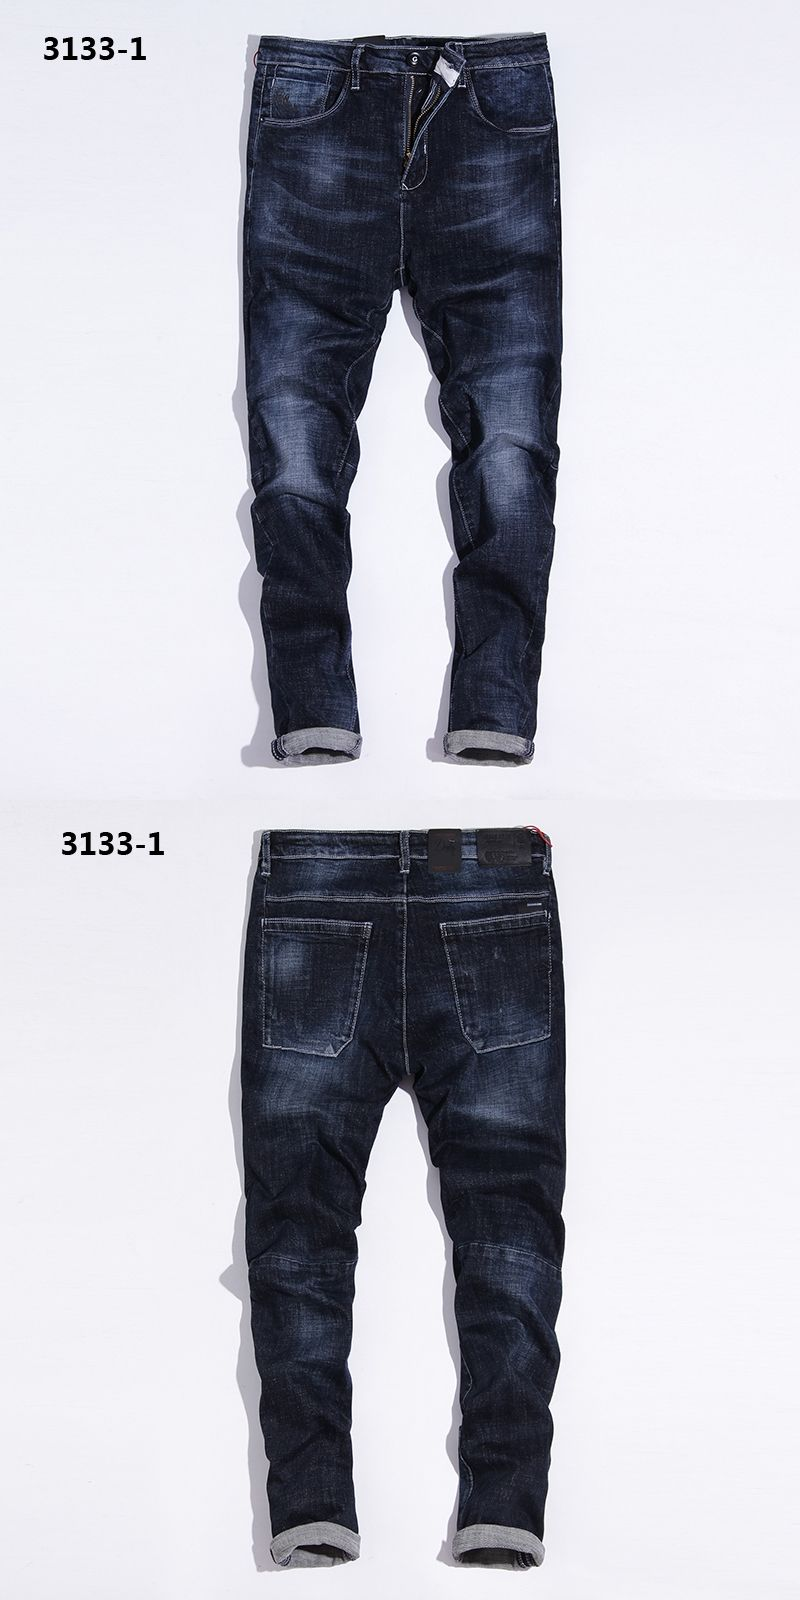 England Dark Blue Jeans Men Waterwash Denim Overalls Men Brand Clothing  Mens Simple Designer Jeans Masculino Pants rtls 3133-1 277282bab0b7c